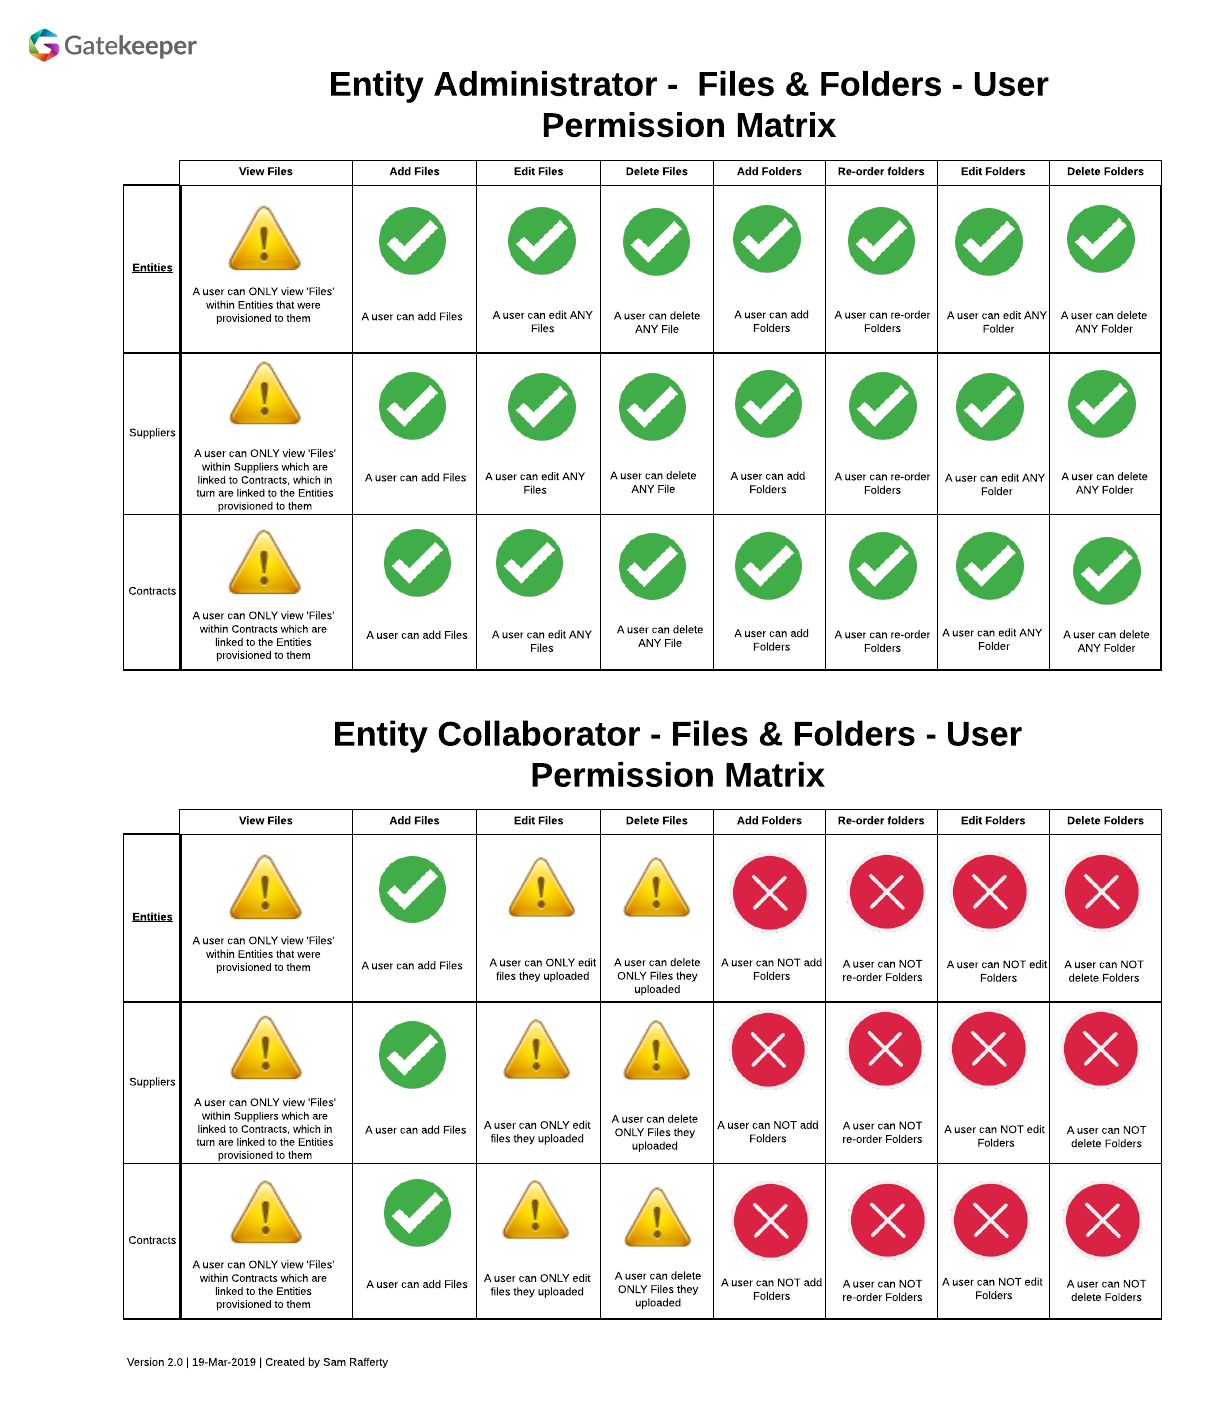 GF - Entity Level - Files & Folders - User Permission Matrix